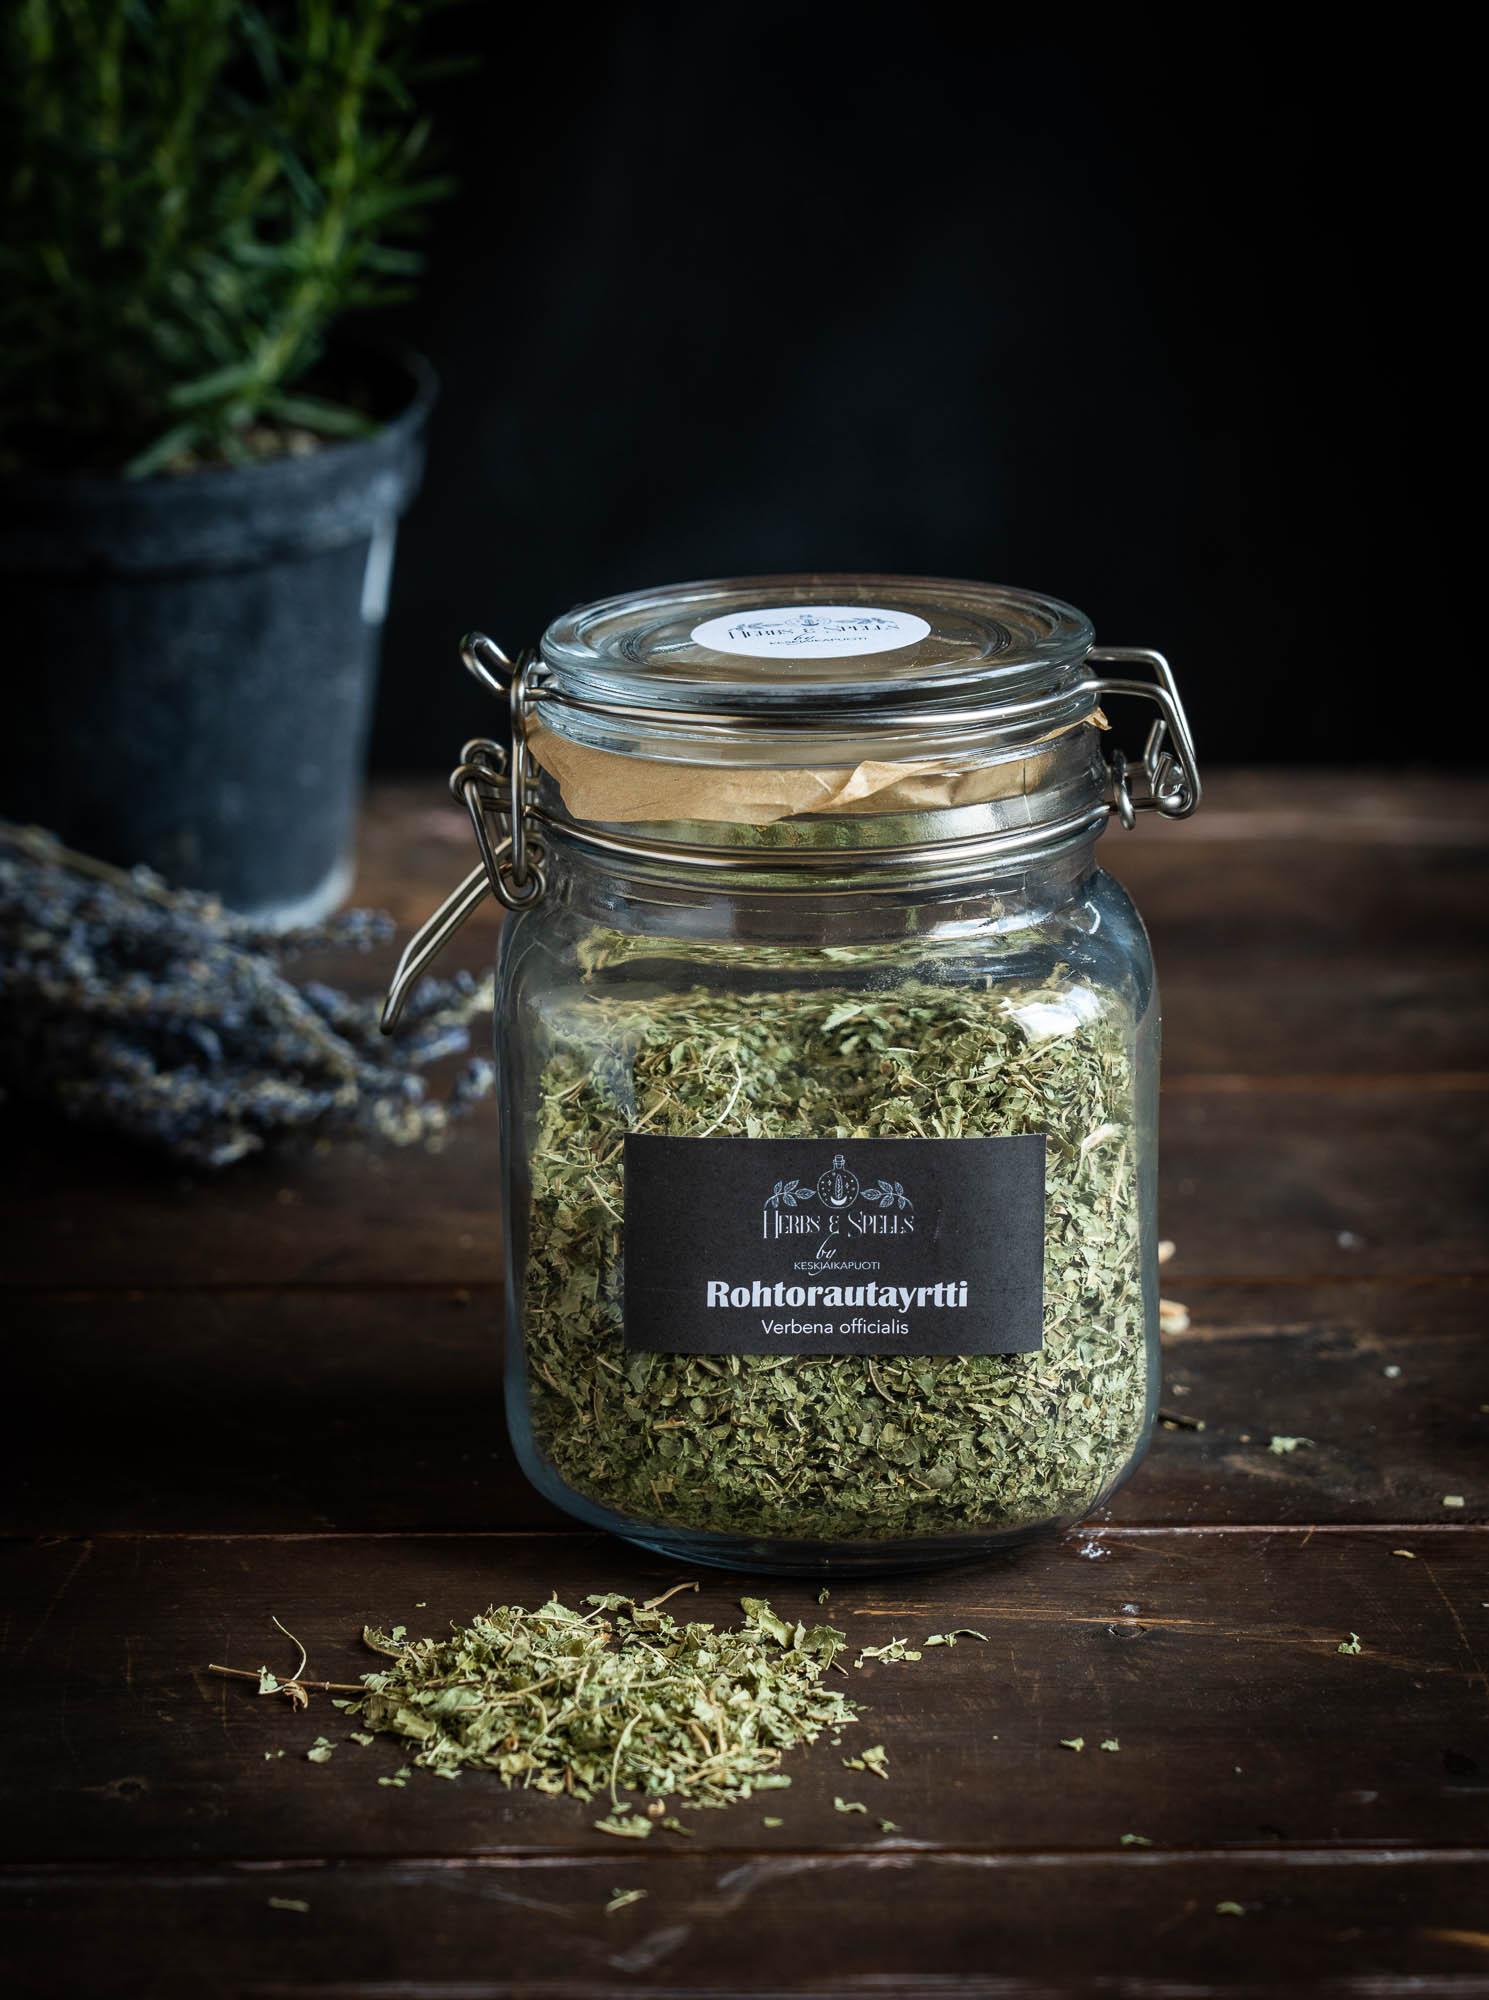 Rohtorautayrtti - Verbena officialis (Herbs & Spells by keskiaikapuoti)